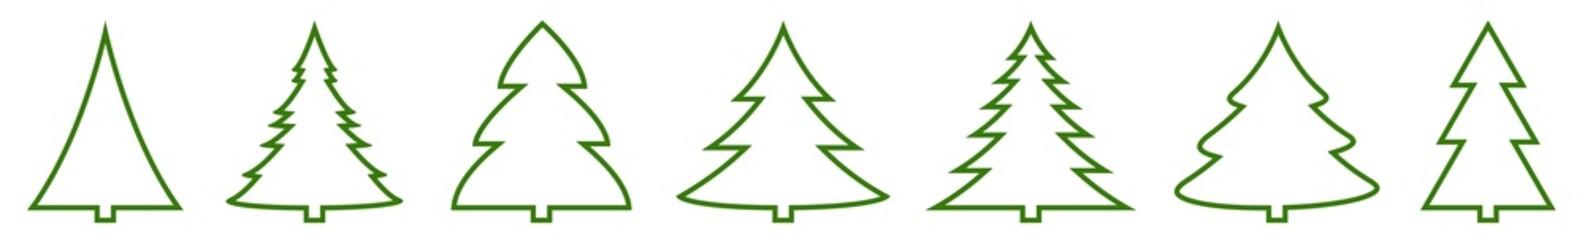 Christmas Tree Green Shape Icon | Fir Tree Illustration | x-mas Symbol | Logo | Isolated Variations